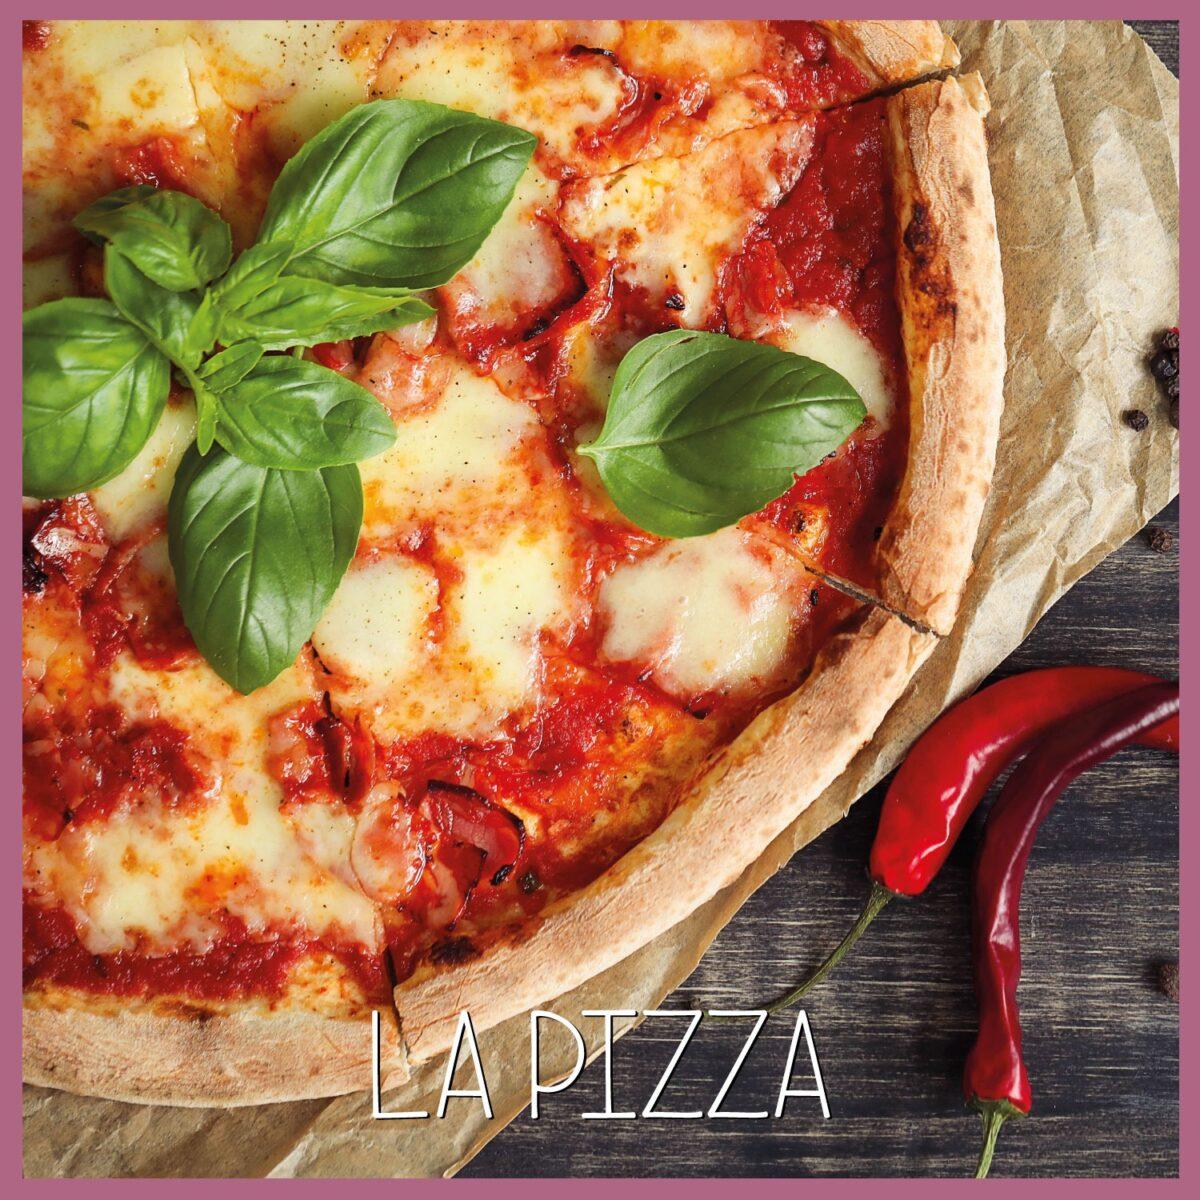 La-pizza--1200x1200.jpeg